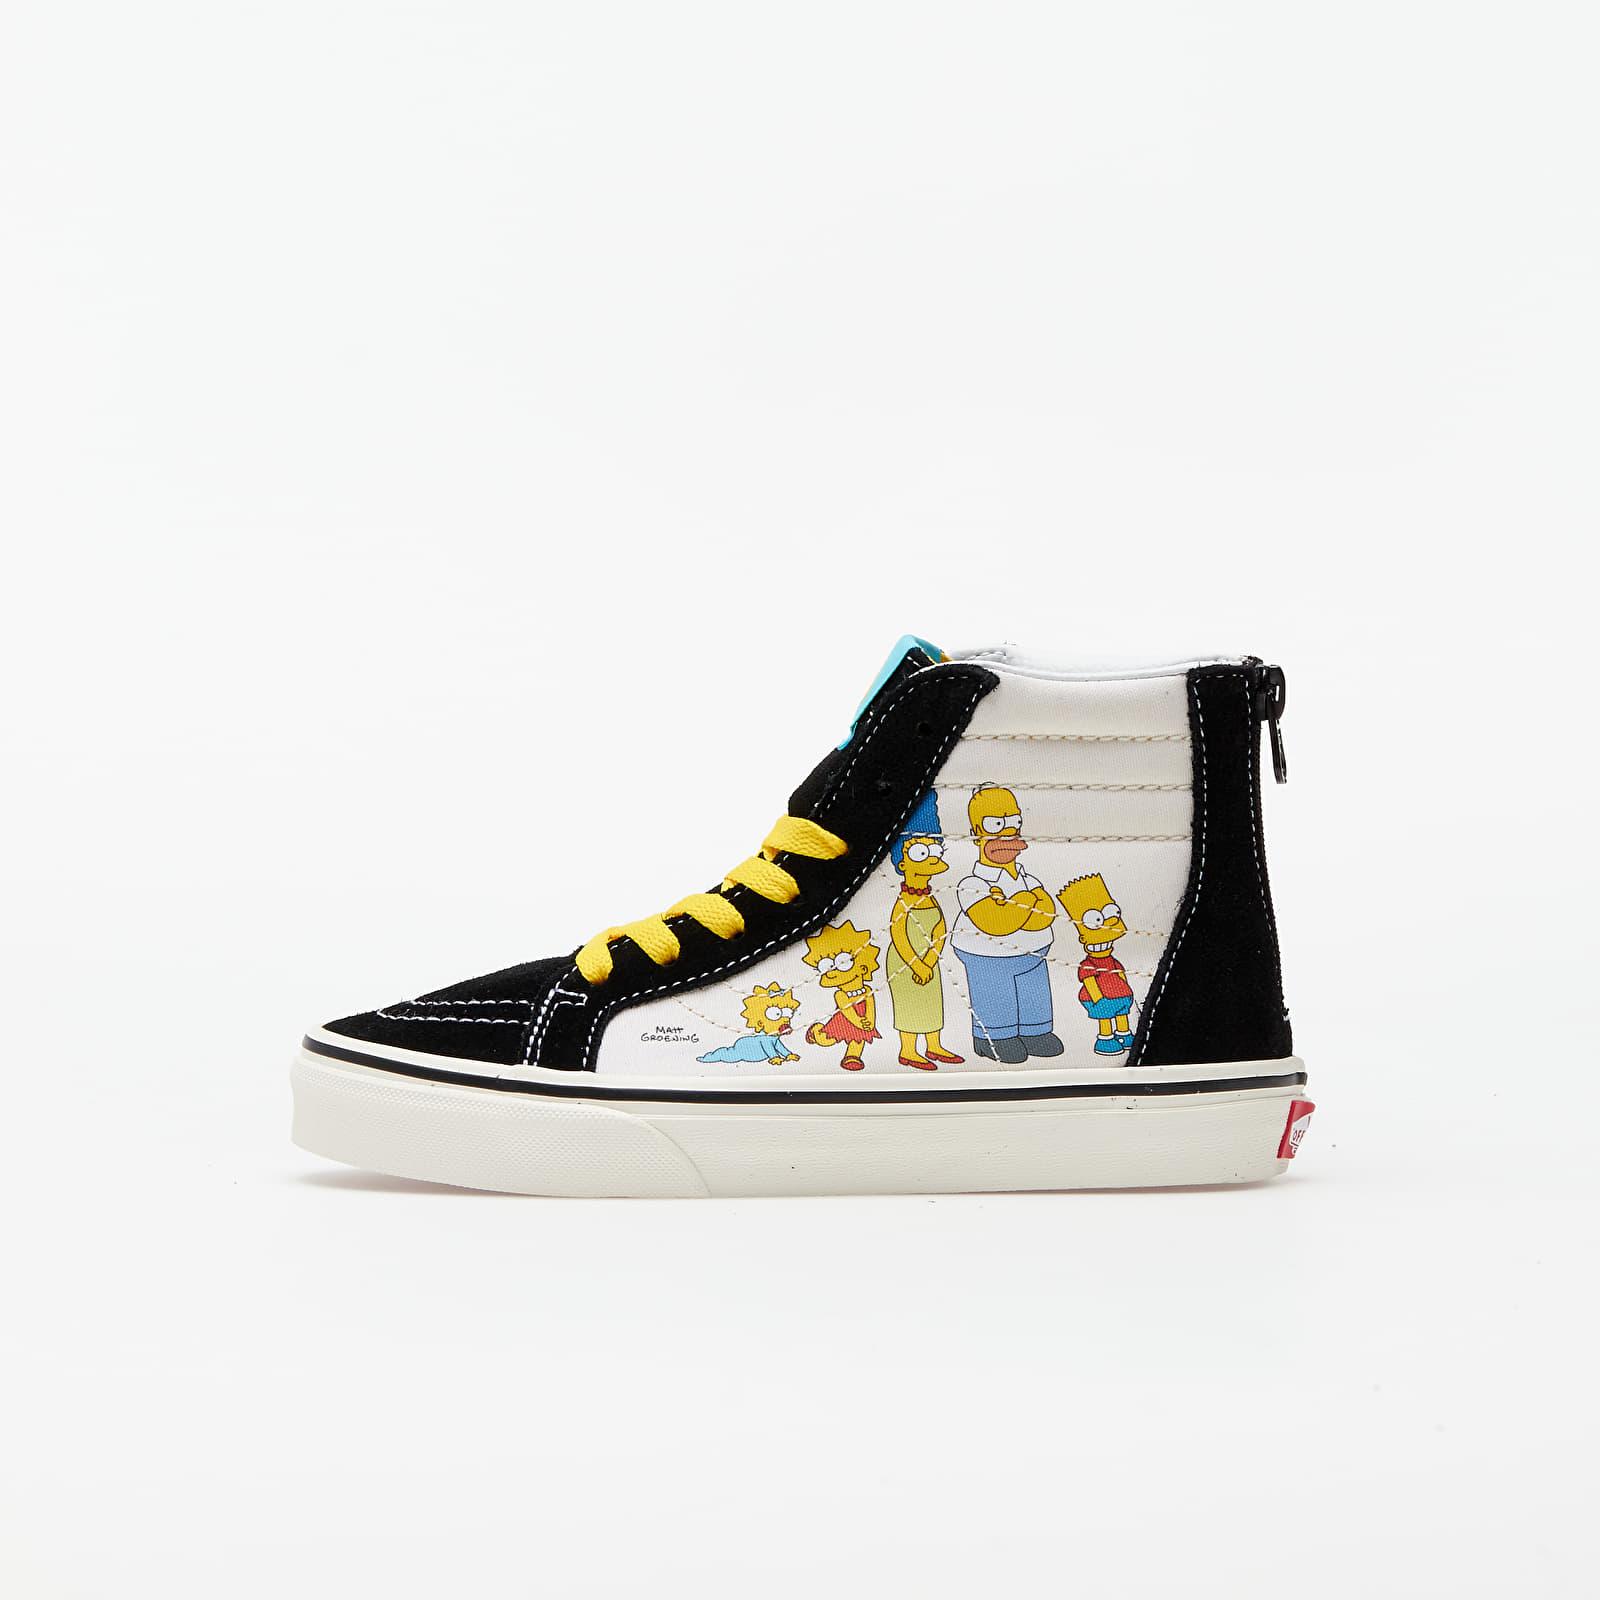 Детская обувь Vans Sk8-Hi Zip (The Simpsons) 1987-2020